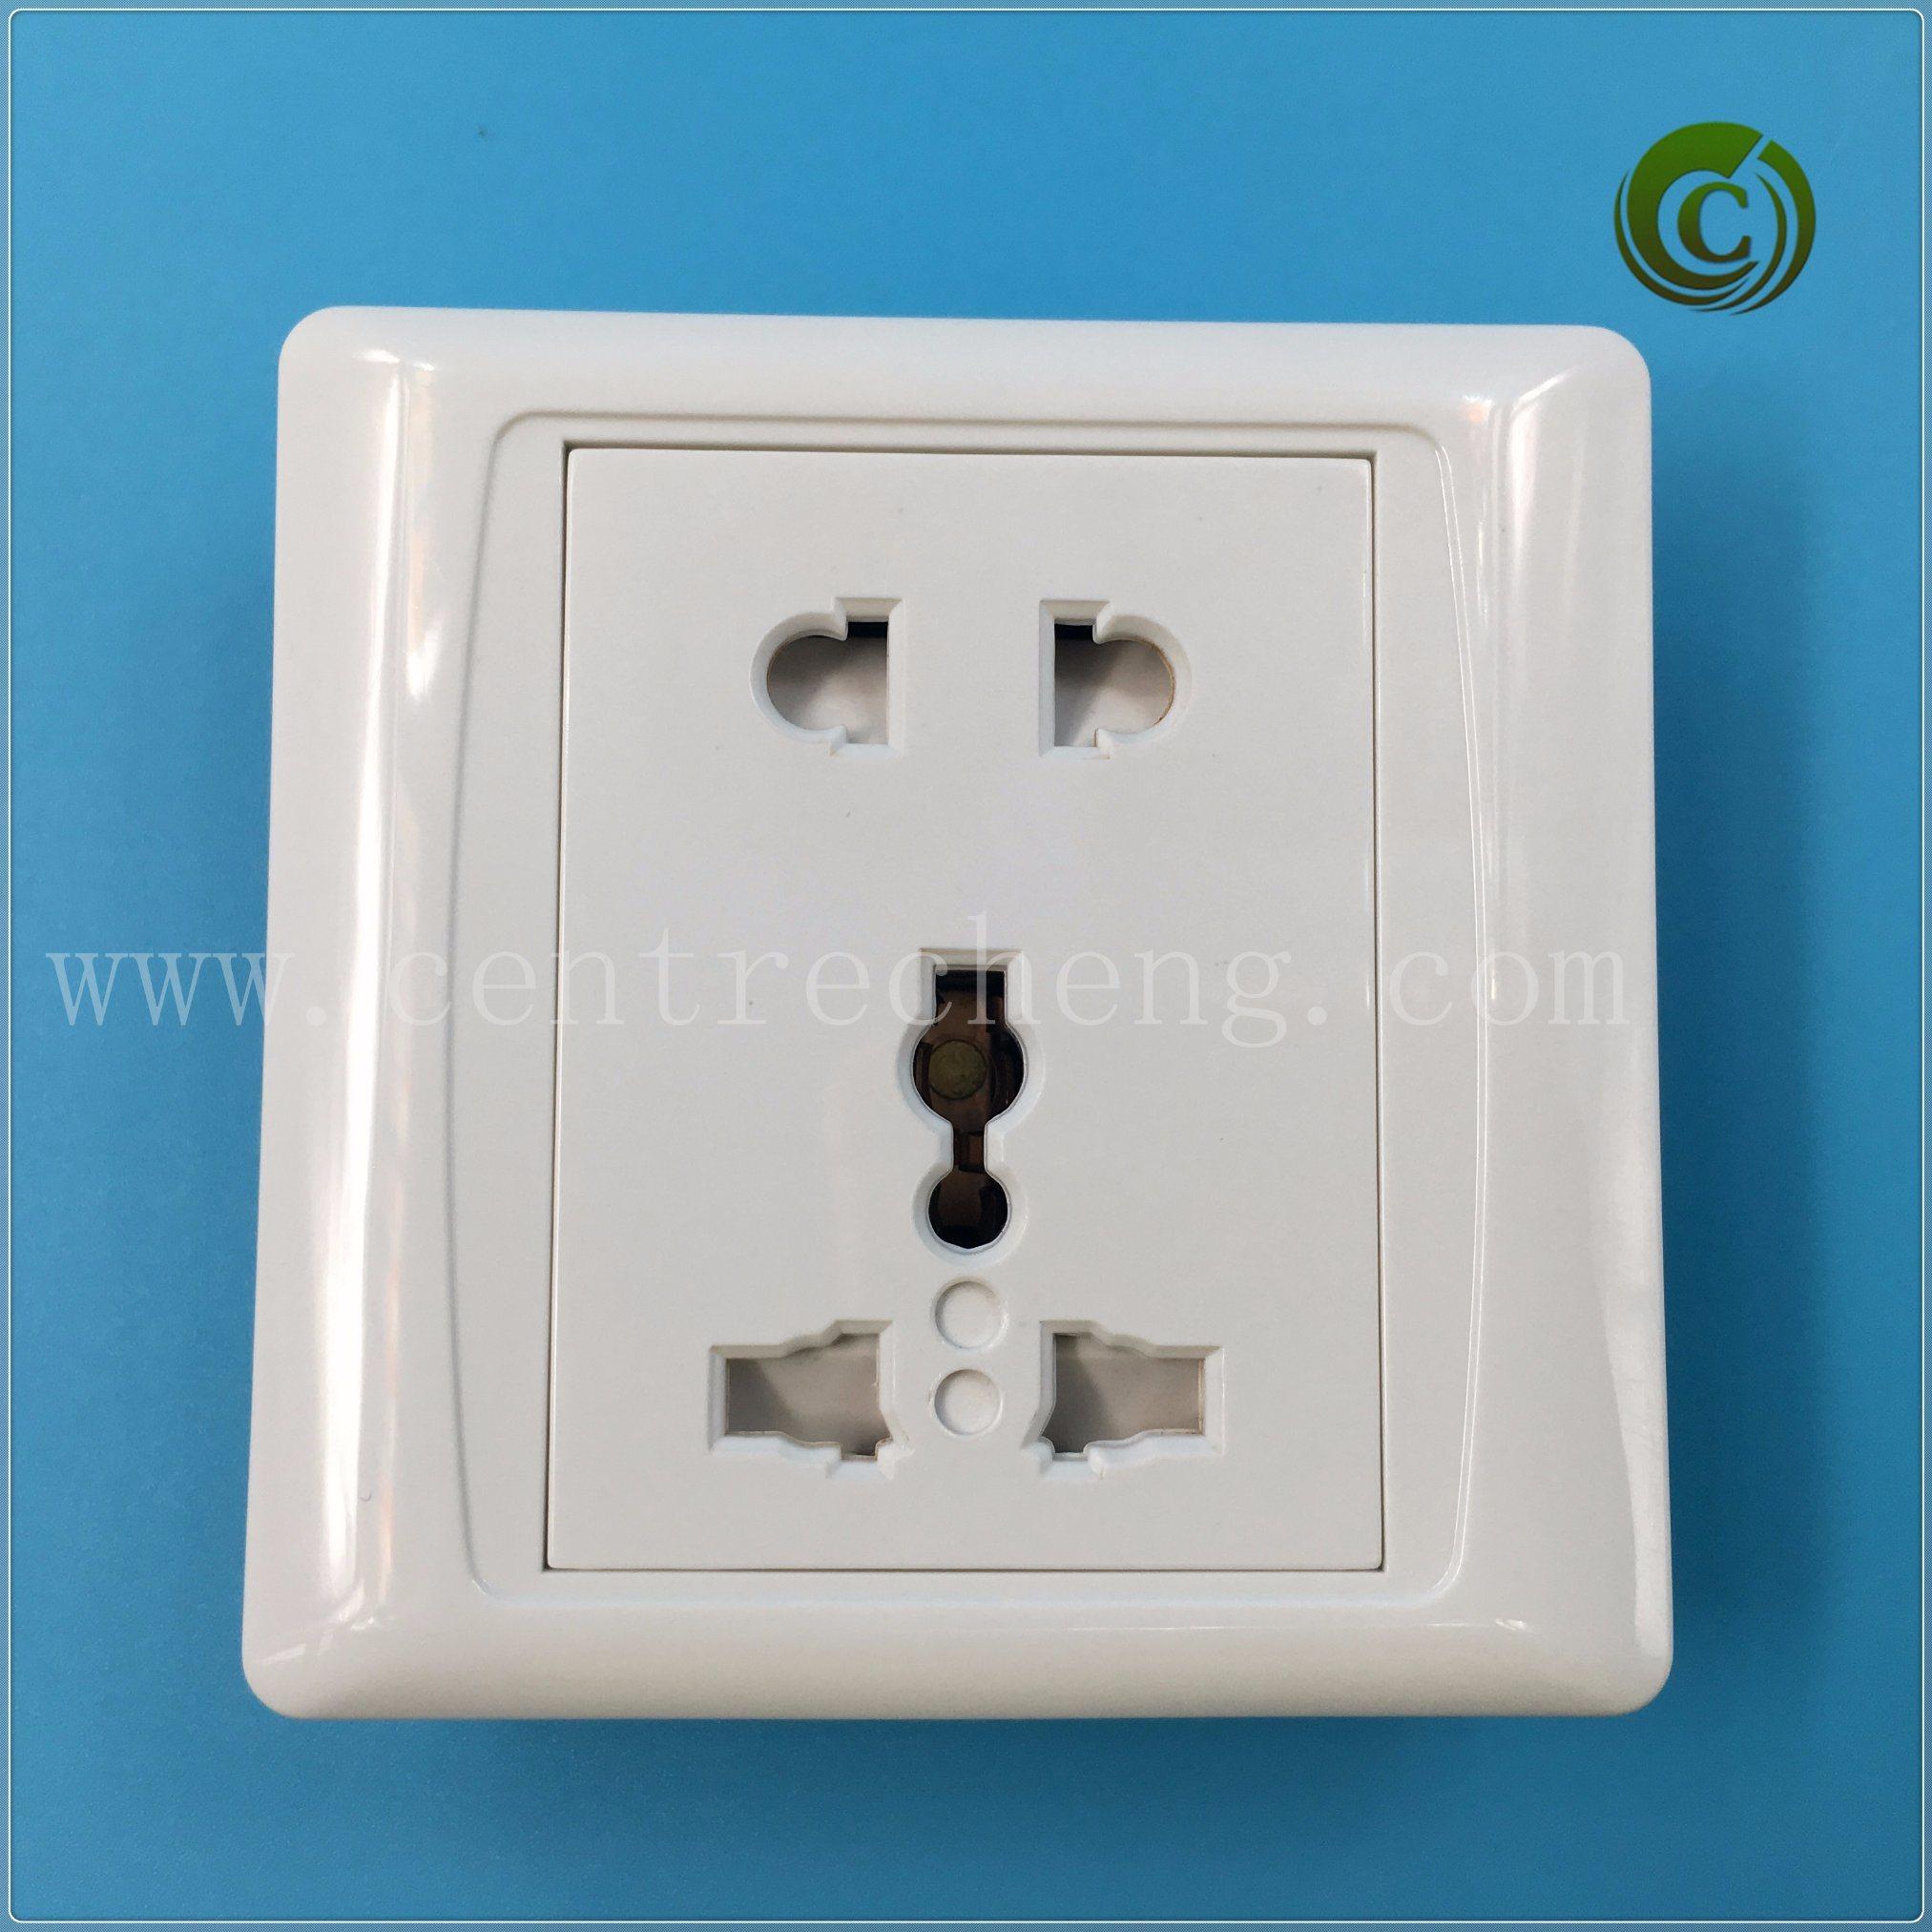 China 13A Wall Plug Outlet Dustproof Plug Plastic Plug Electrical ...